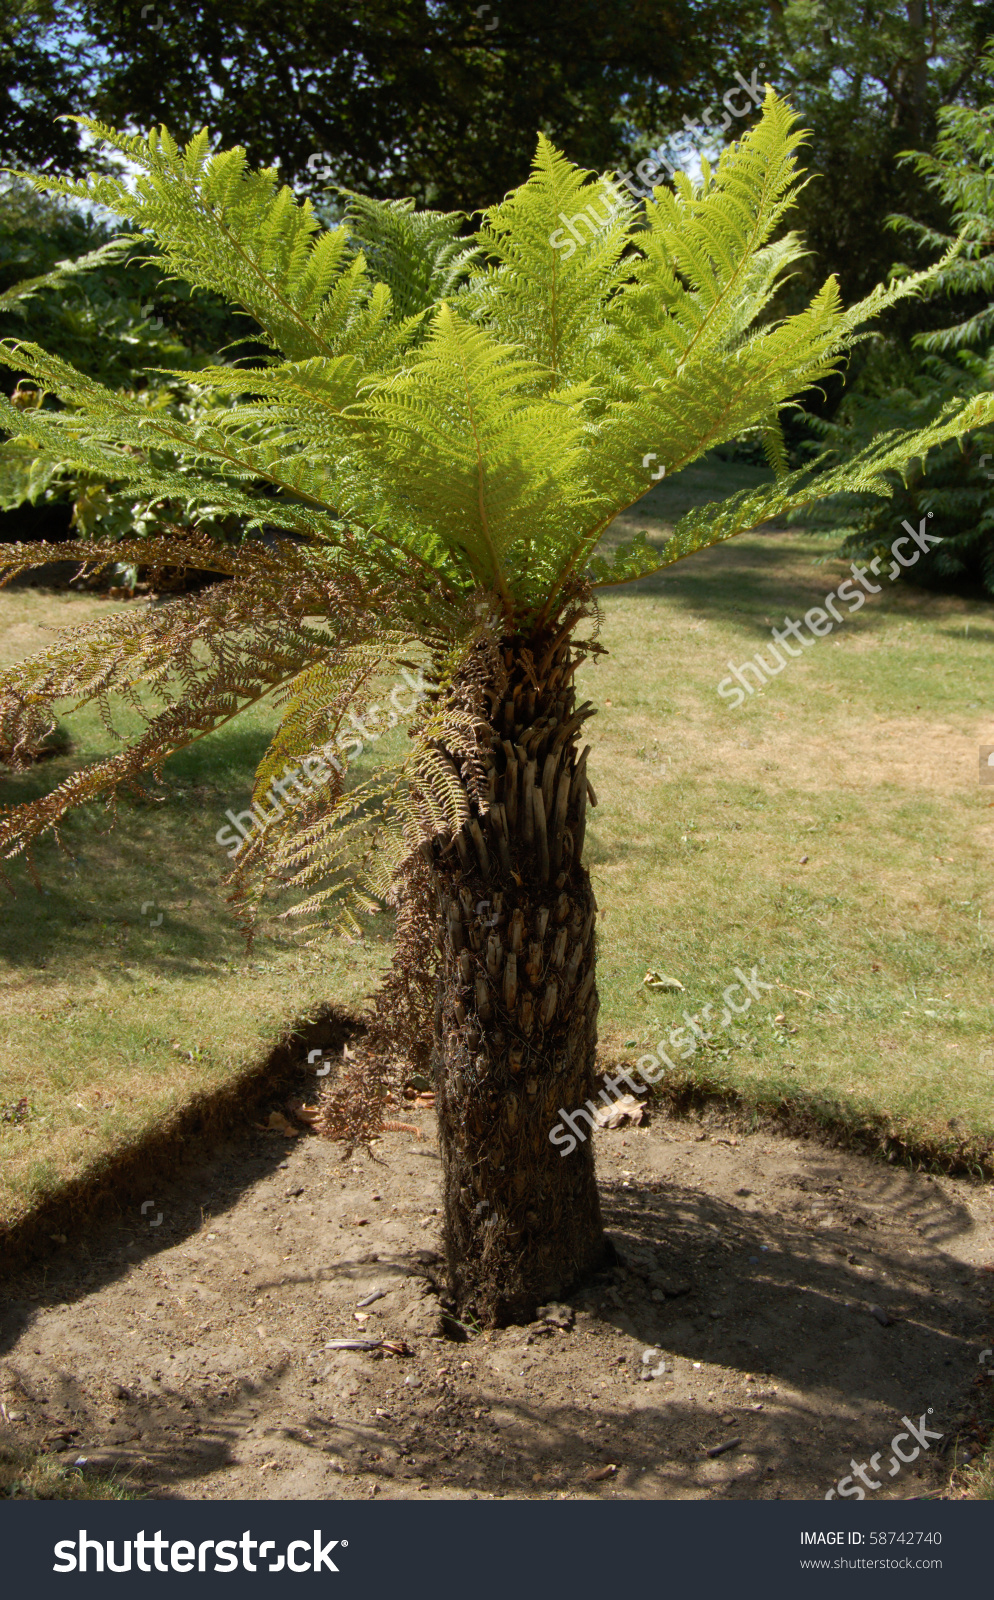 Dicksonia Antarctica Tree Fern In Battersea Park In London.